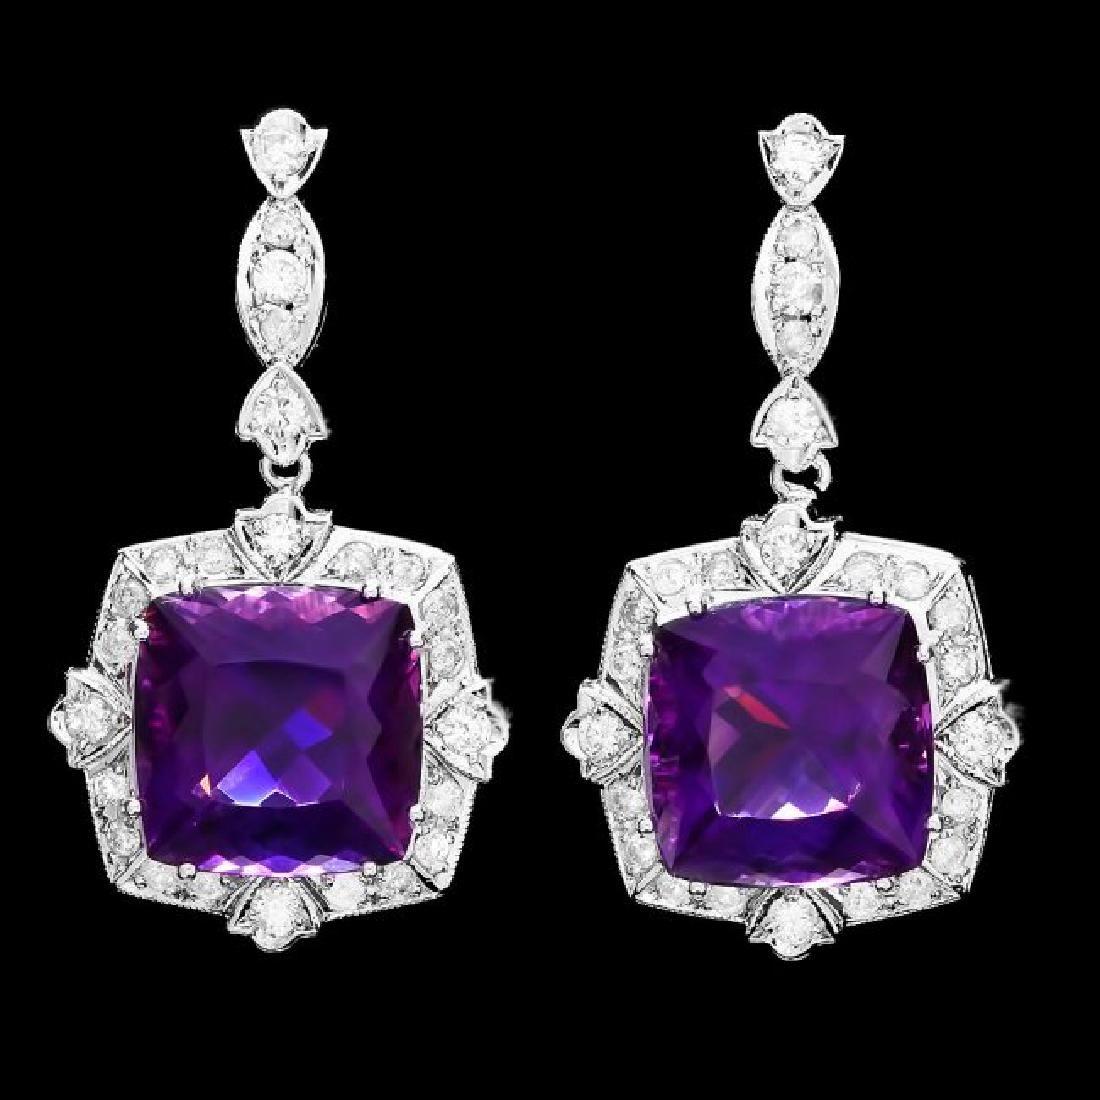 14k Gold 24ct Amethyst 1.85ct Diamond Earrings